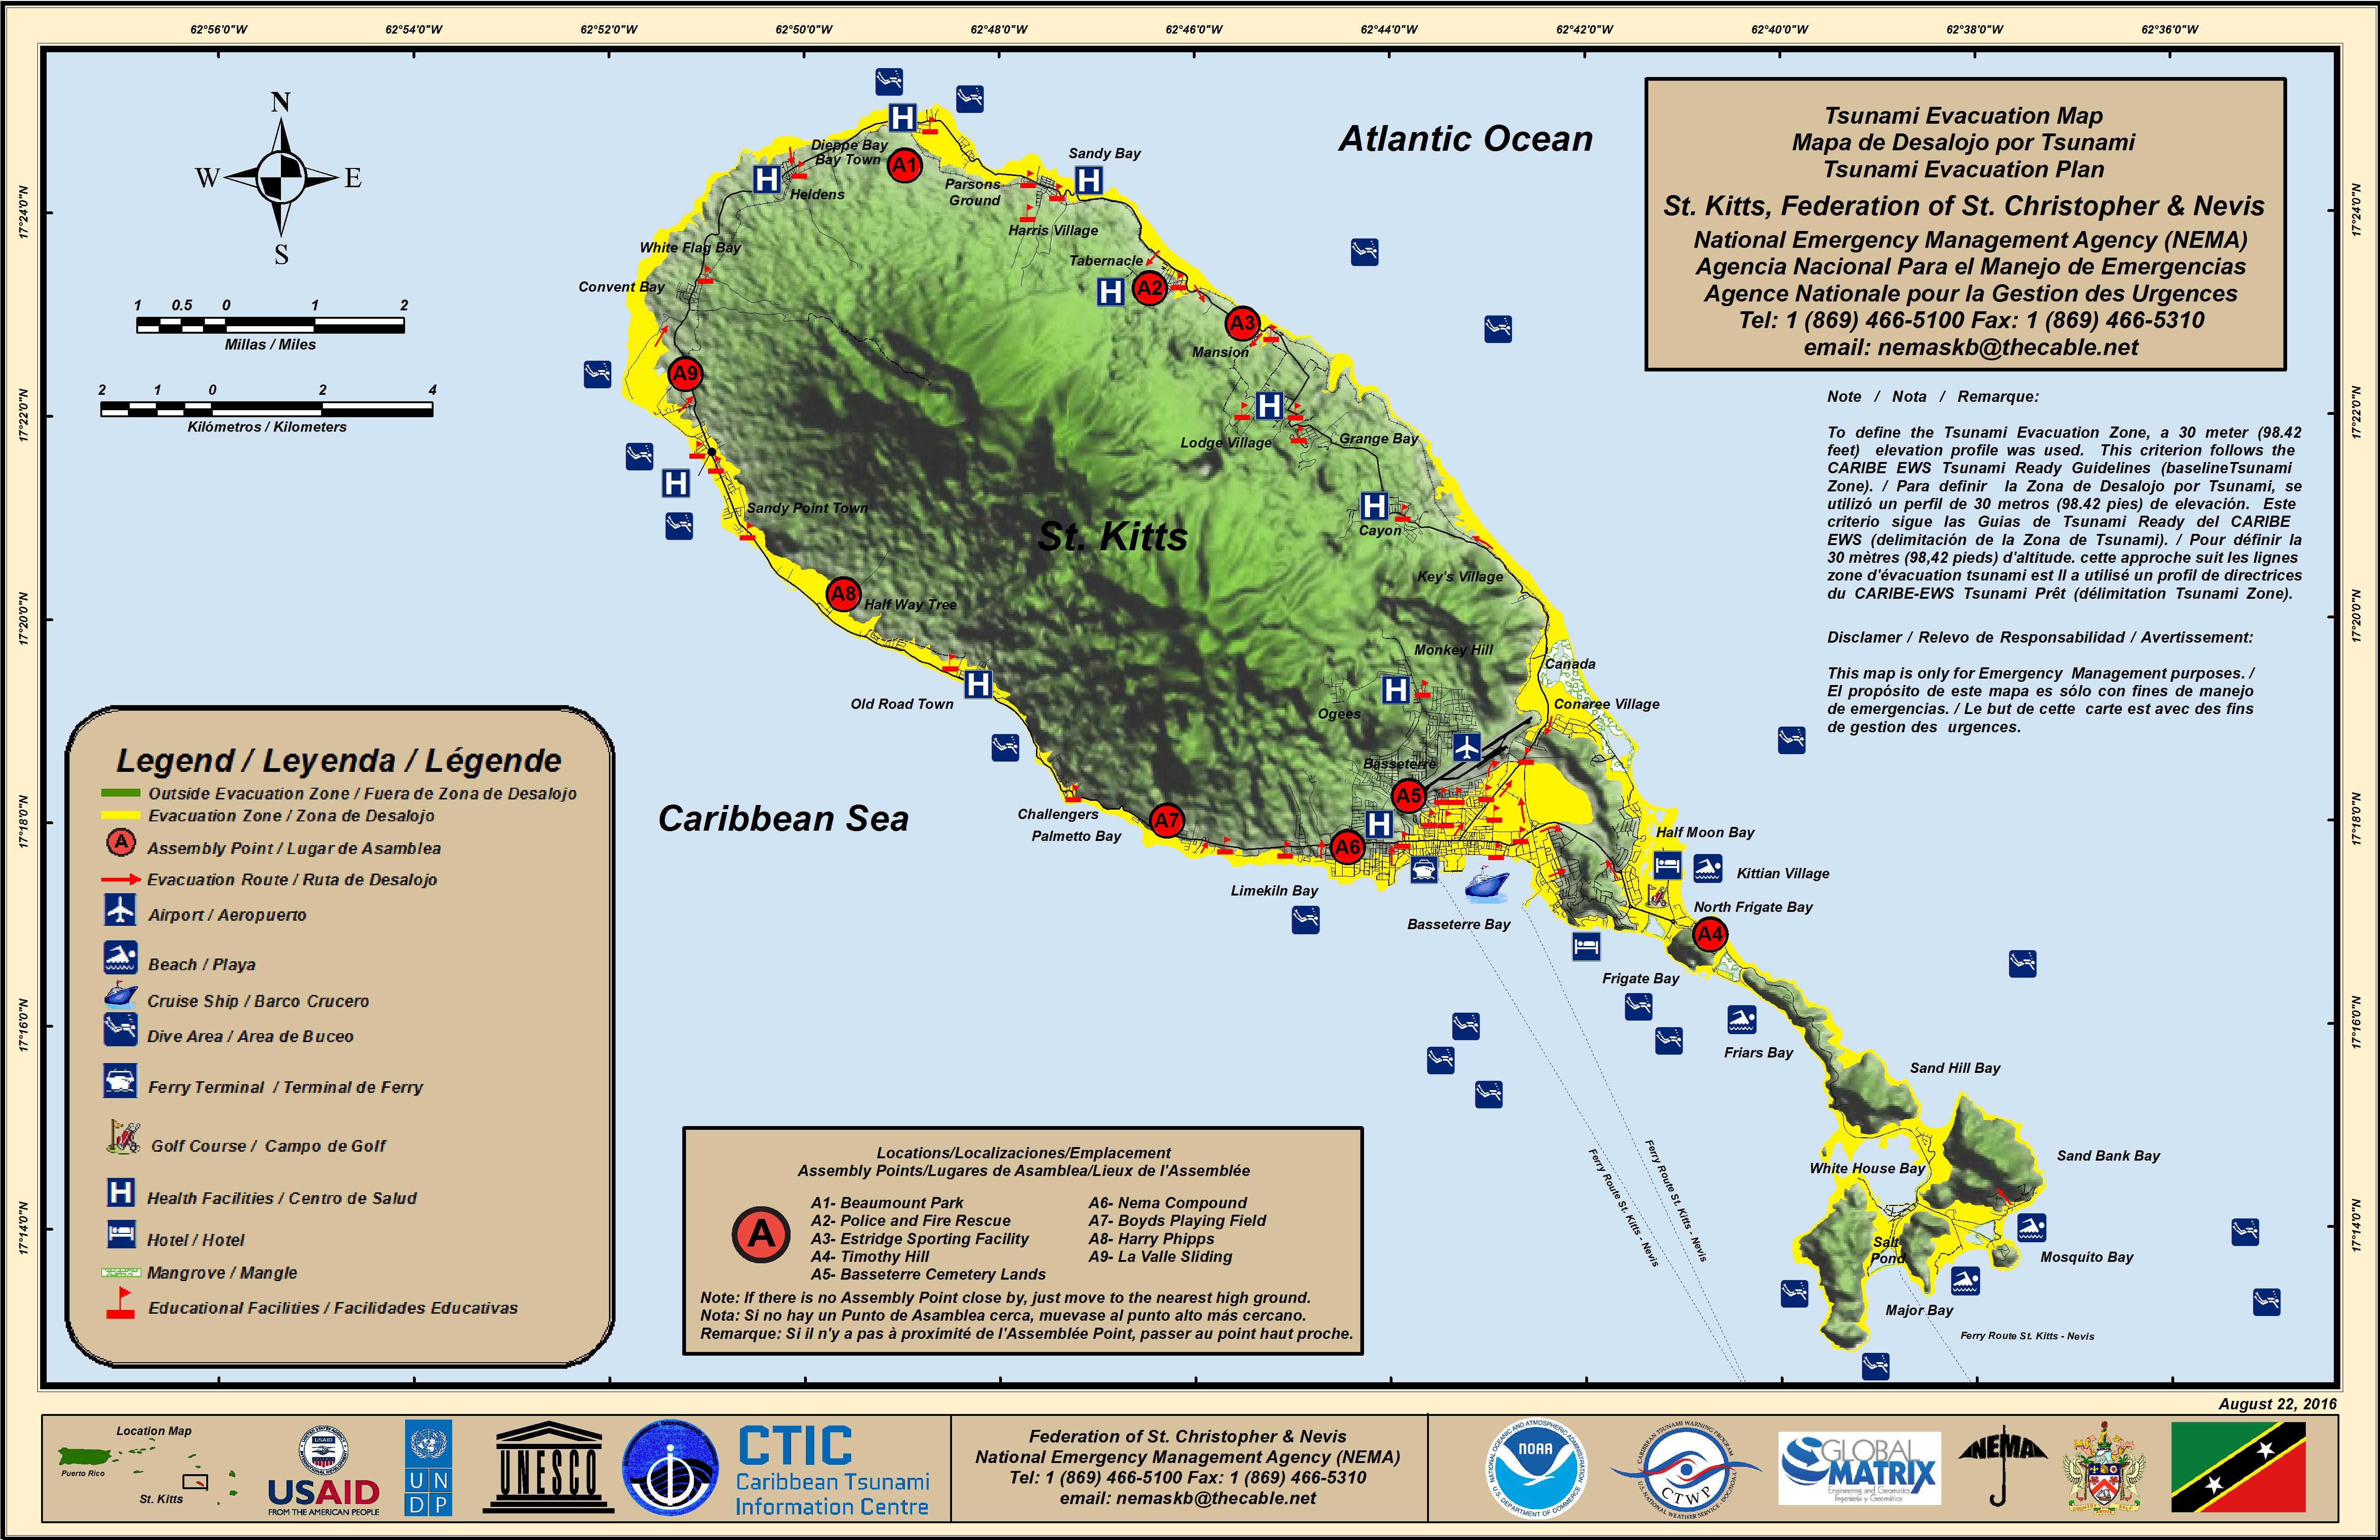 St Kitts And Nevis Tsunami Evacuation Maps Nema - Saint kitts and nevis map